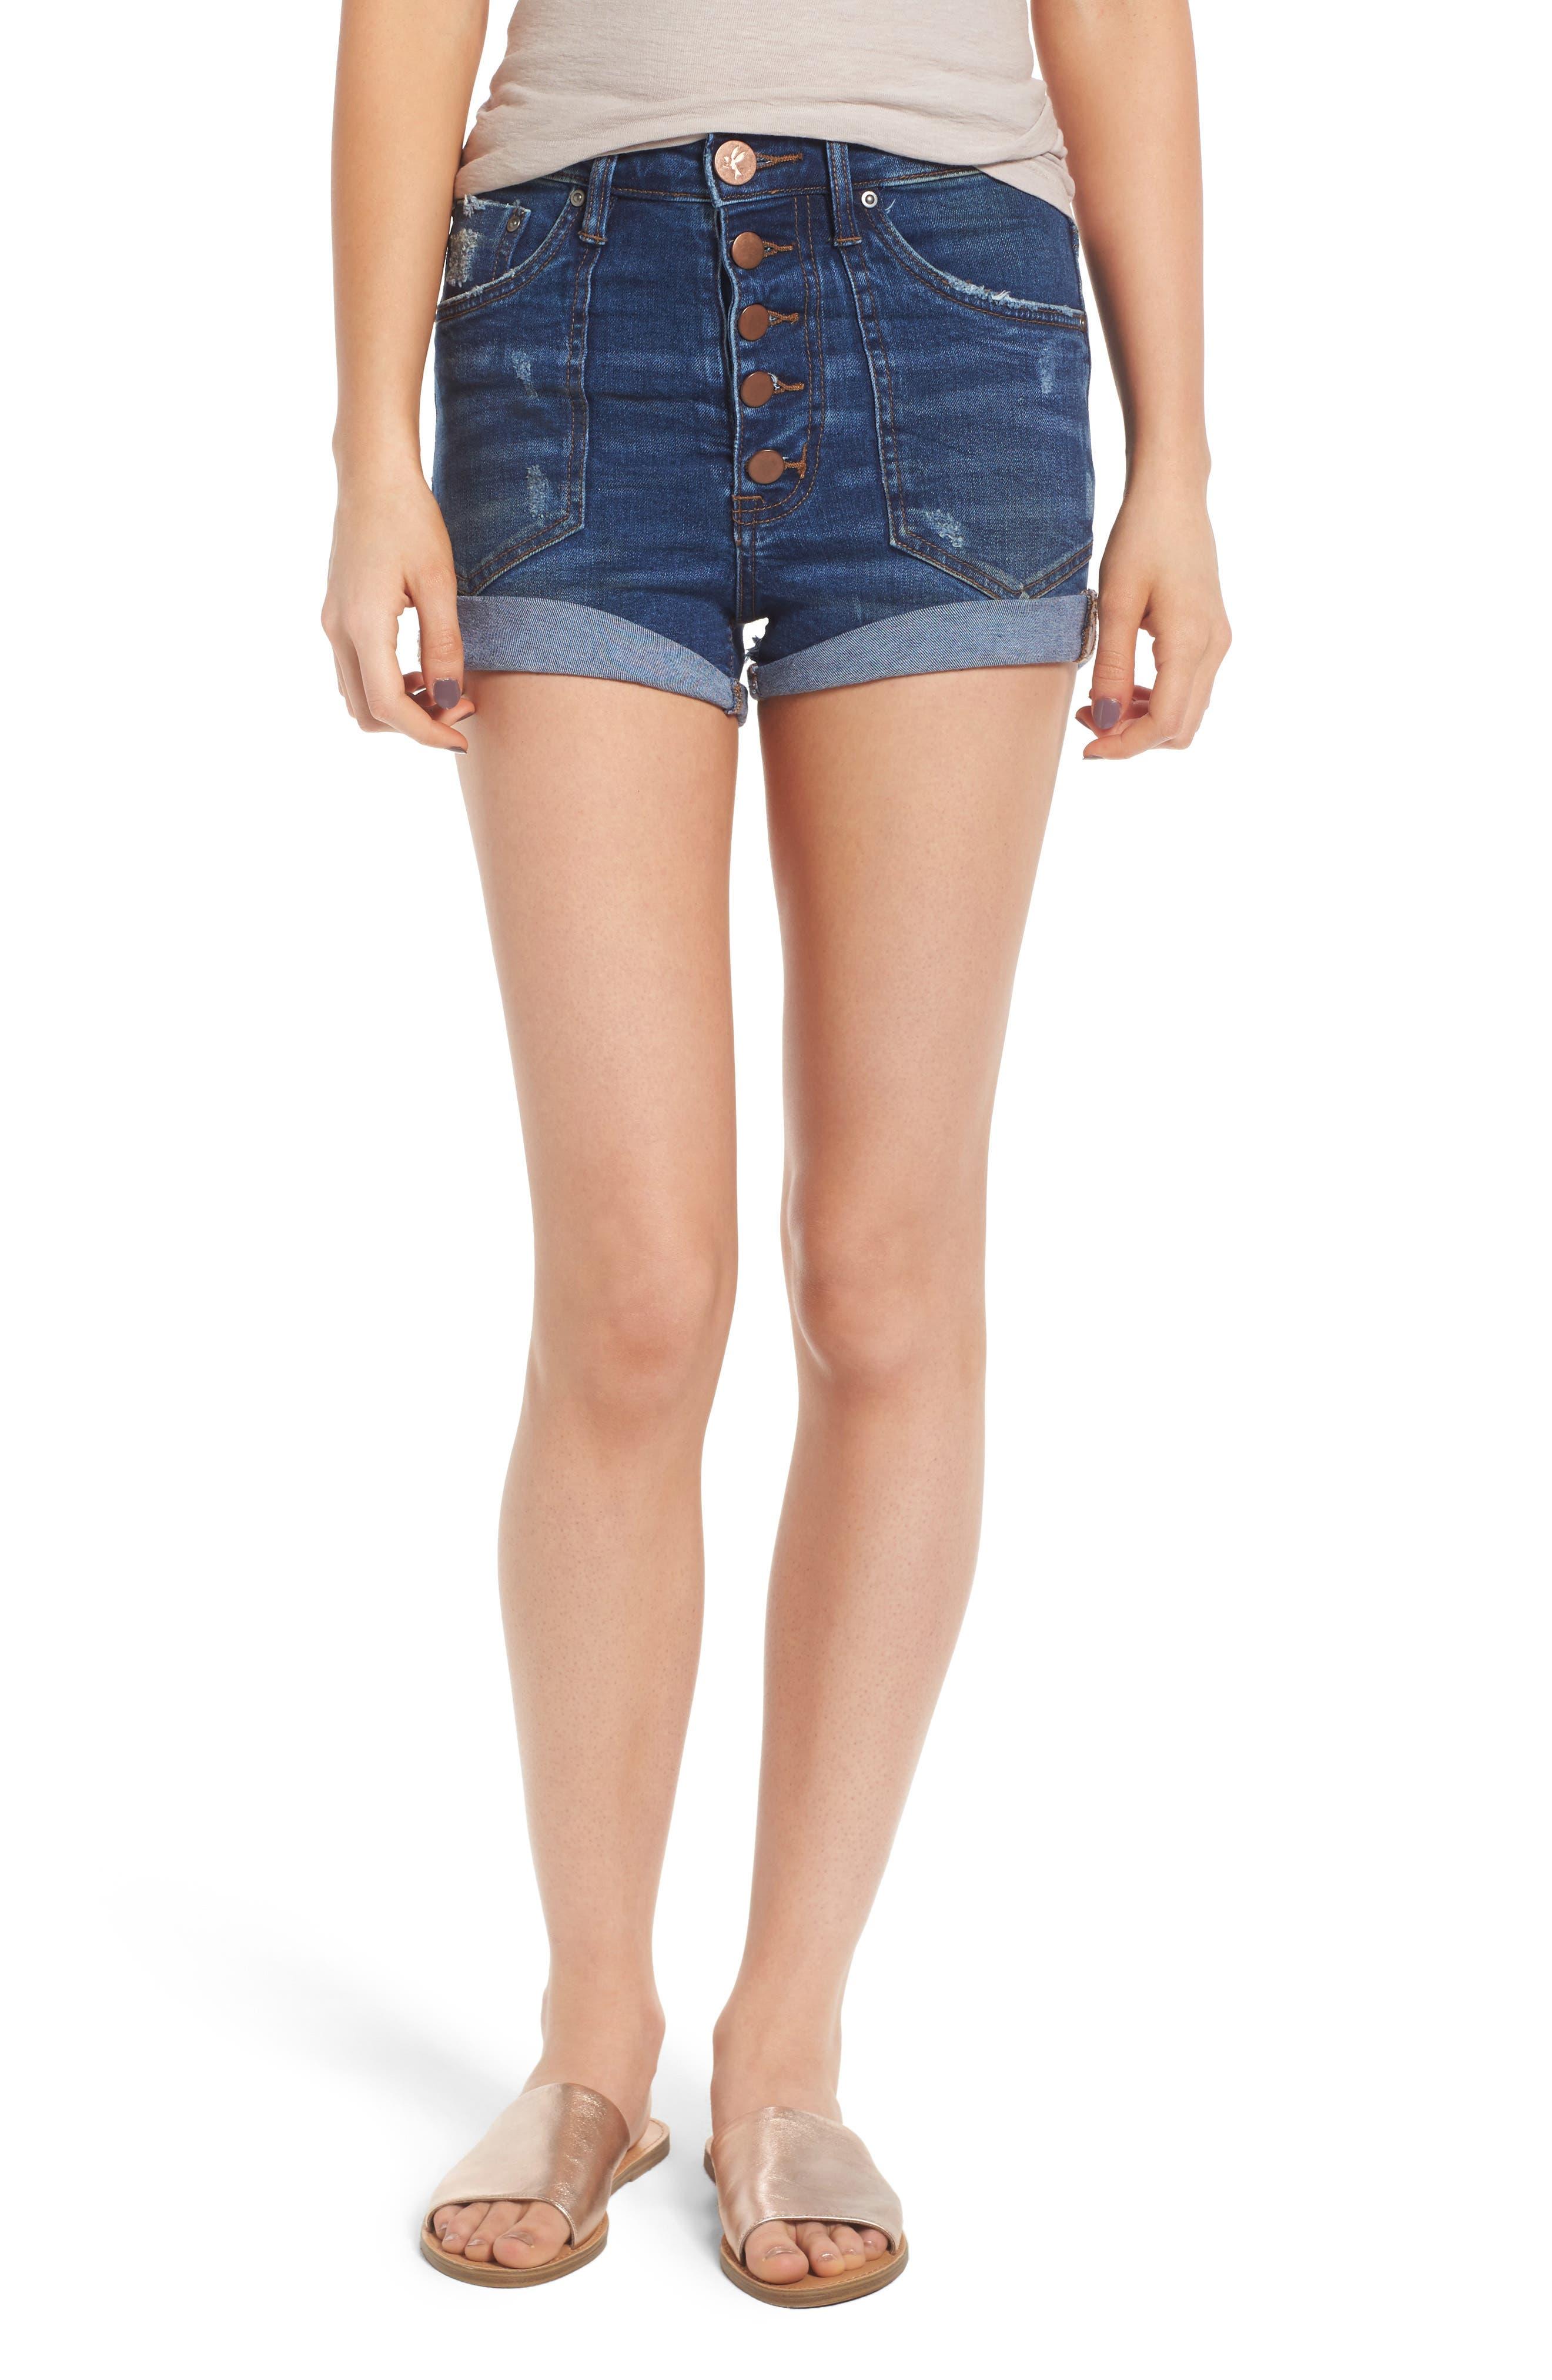 One Teaspoon Denim Shorts (Bonnie Blue)